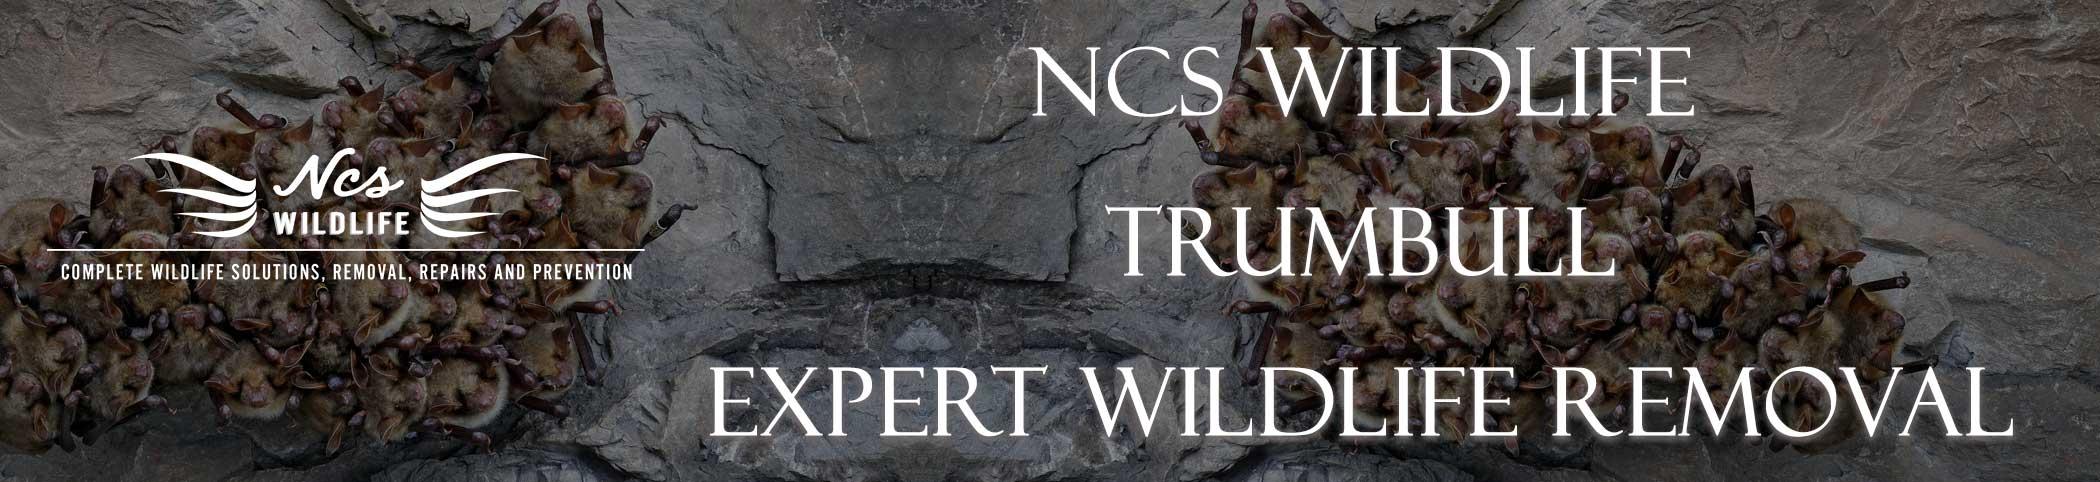 ncs-wildlife-trumbull